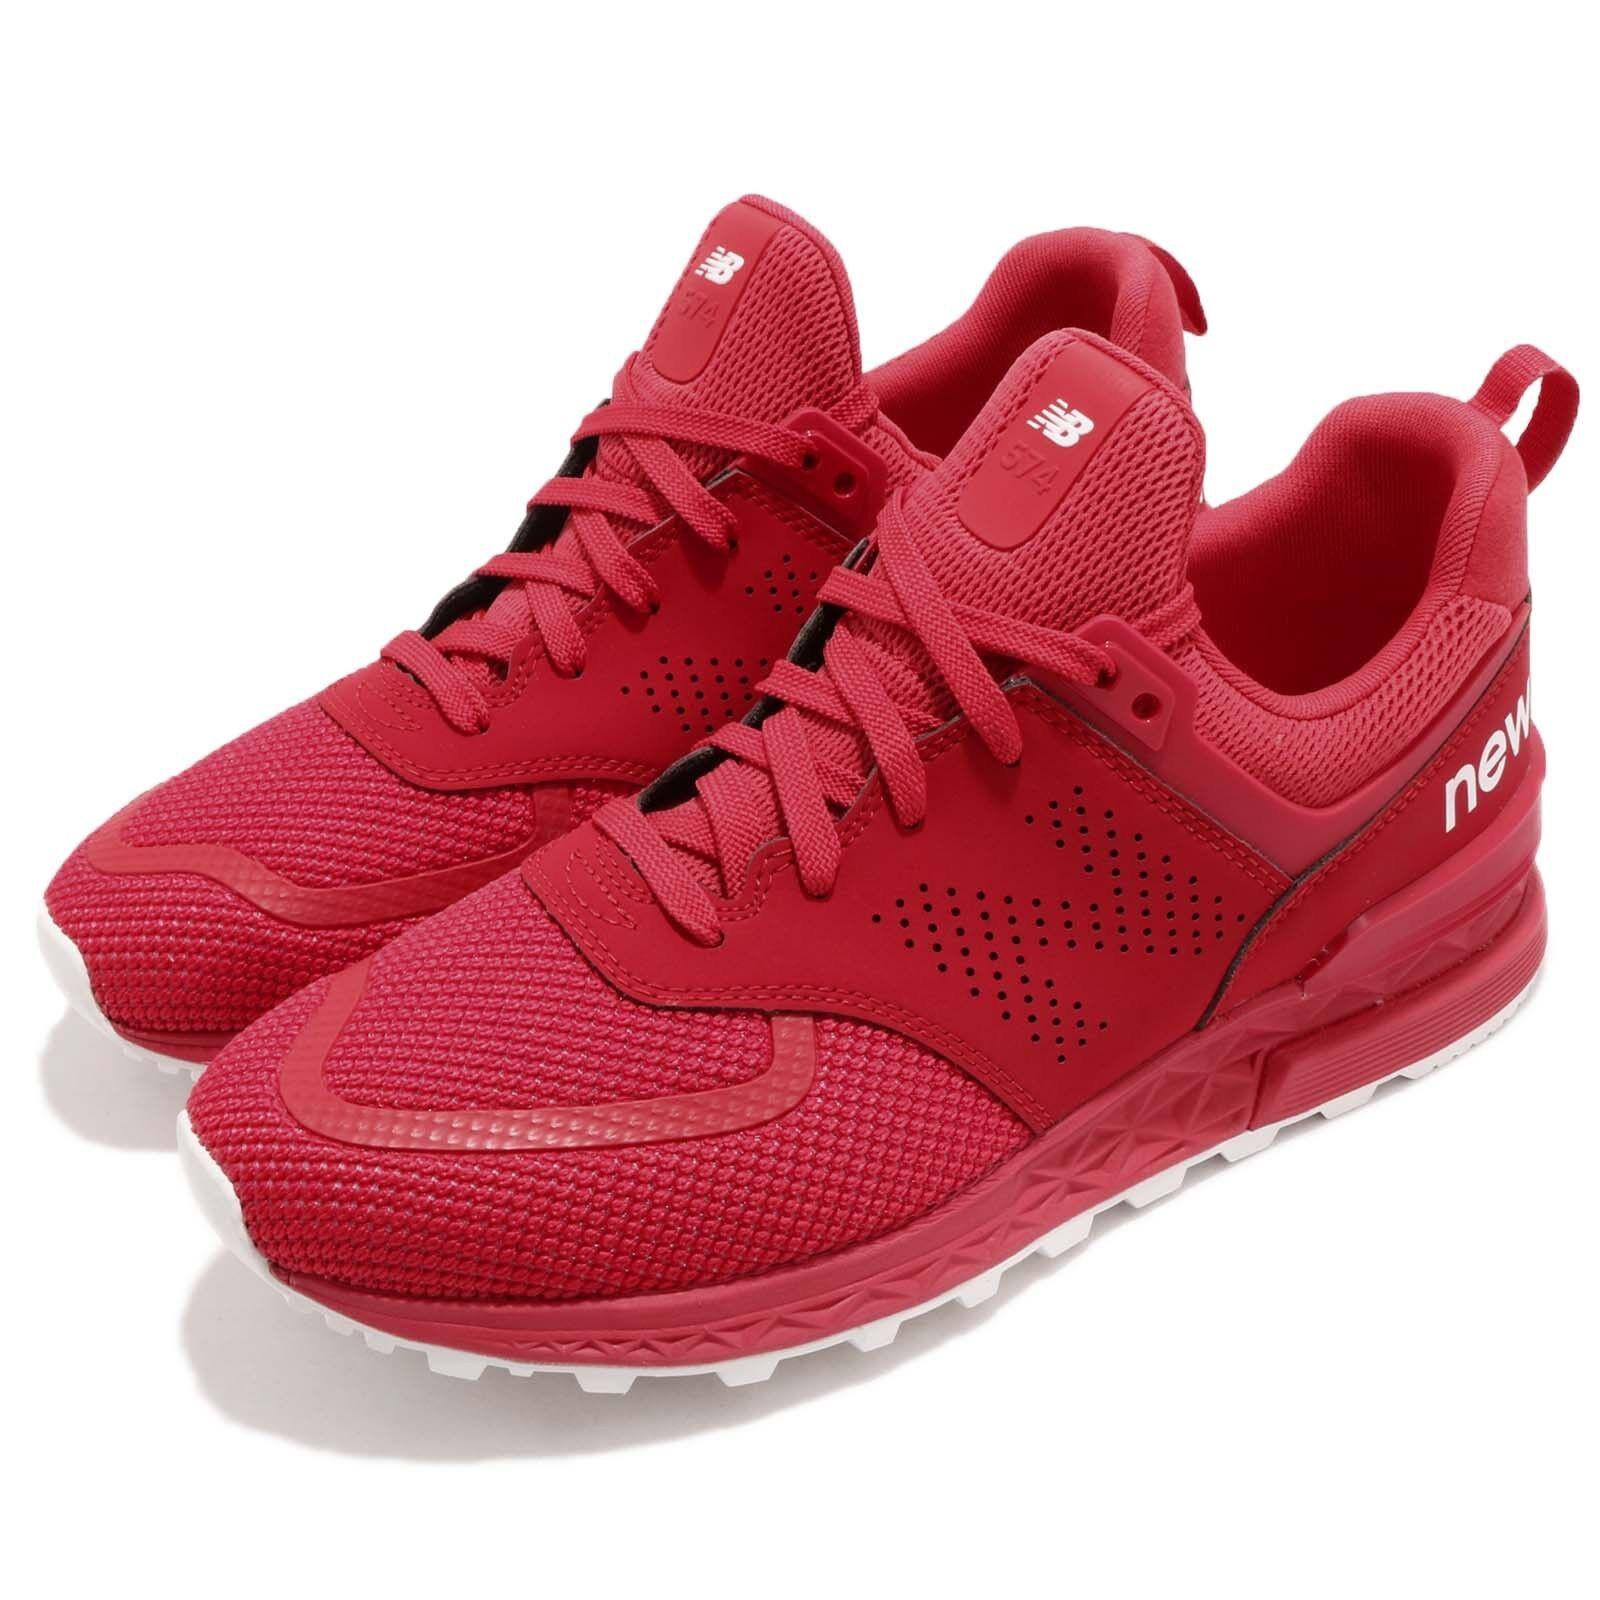 MS574PCR Informales D Rojo Blanco New Balance Hombres Correr Informales MS574PCR Zapatos  Tenis MS 2018 PCRD 057fd9